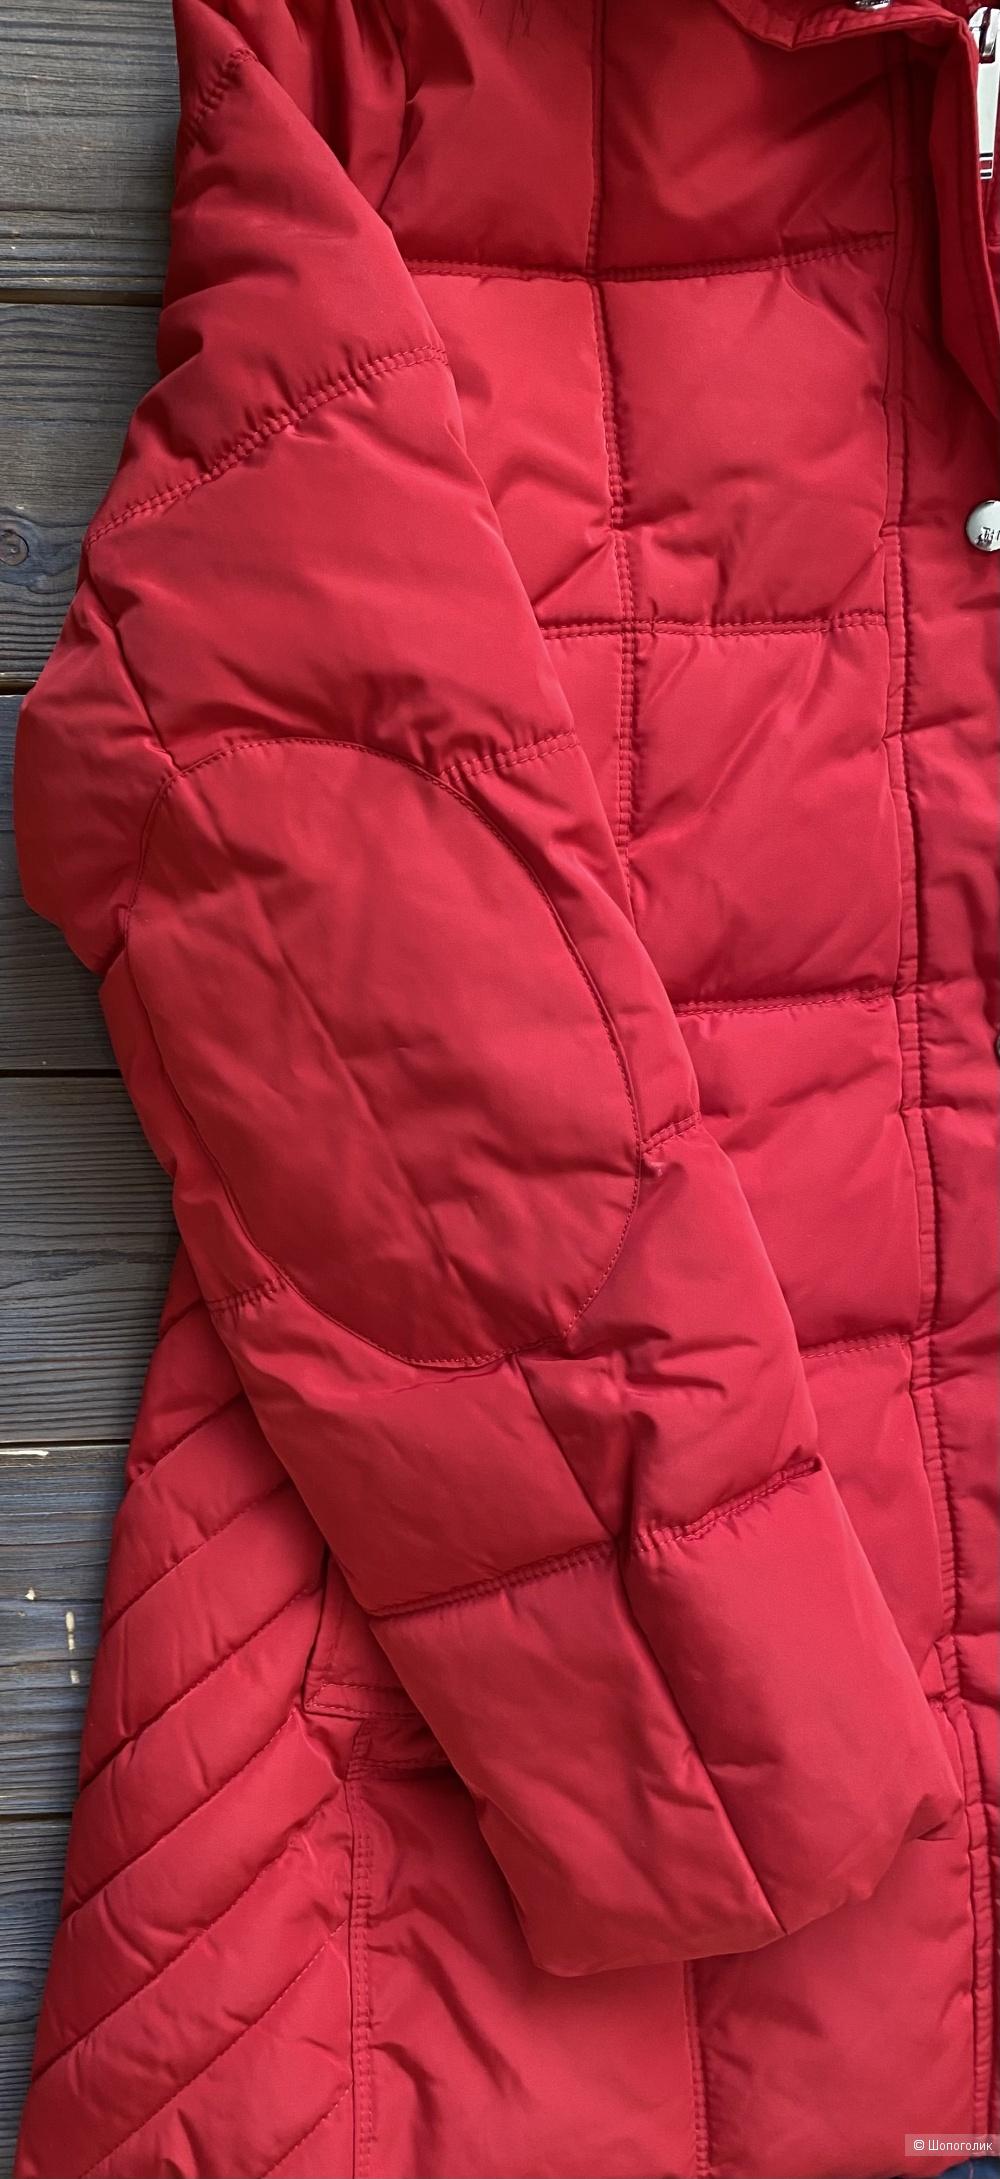 Куртка Tommy Hilfiger р. L 46-48